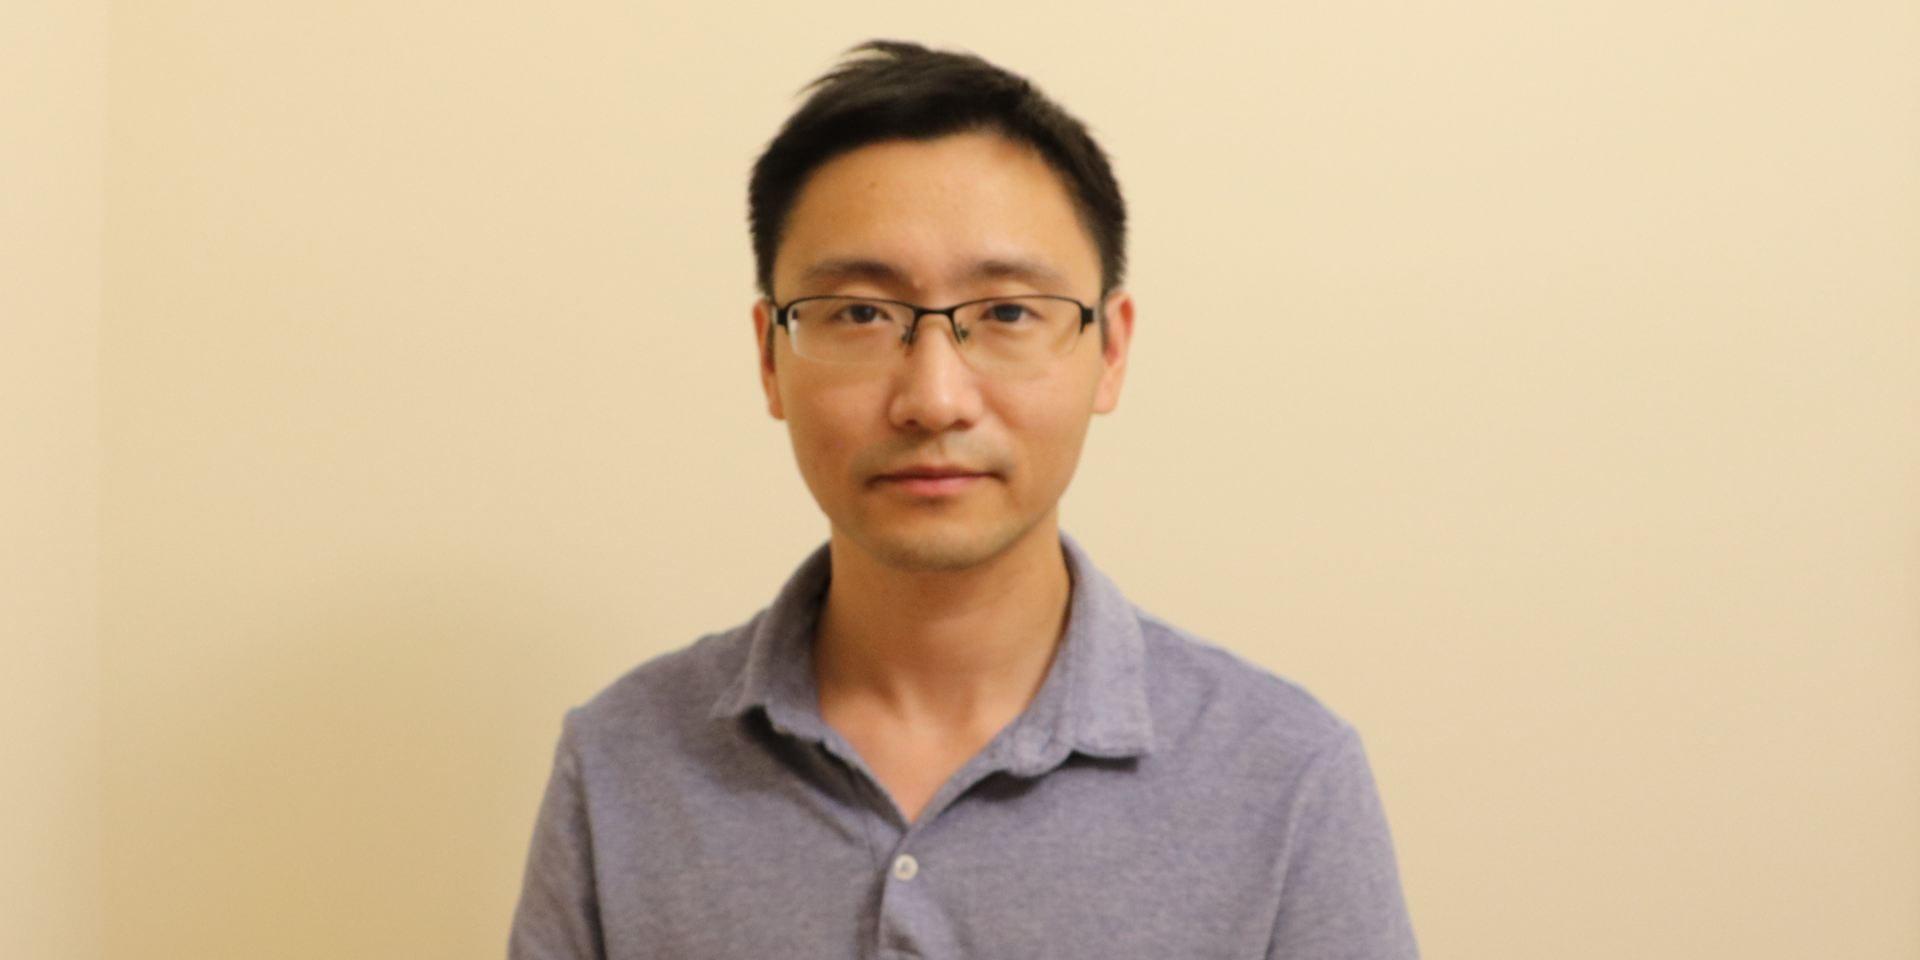 Yinzhi Fang, MRSEC postdoc fellow